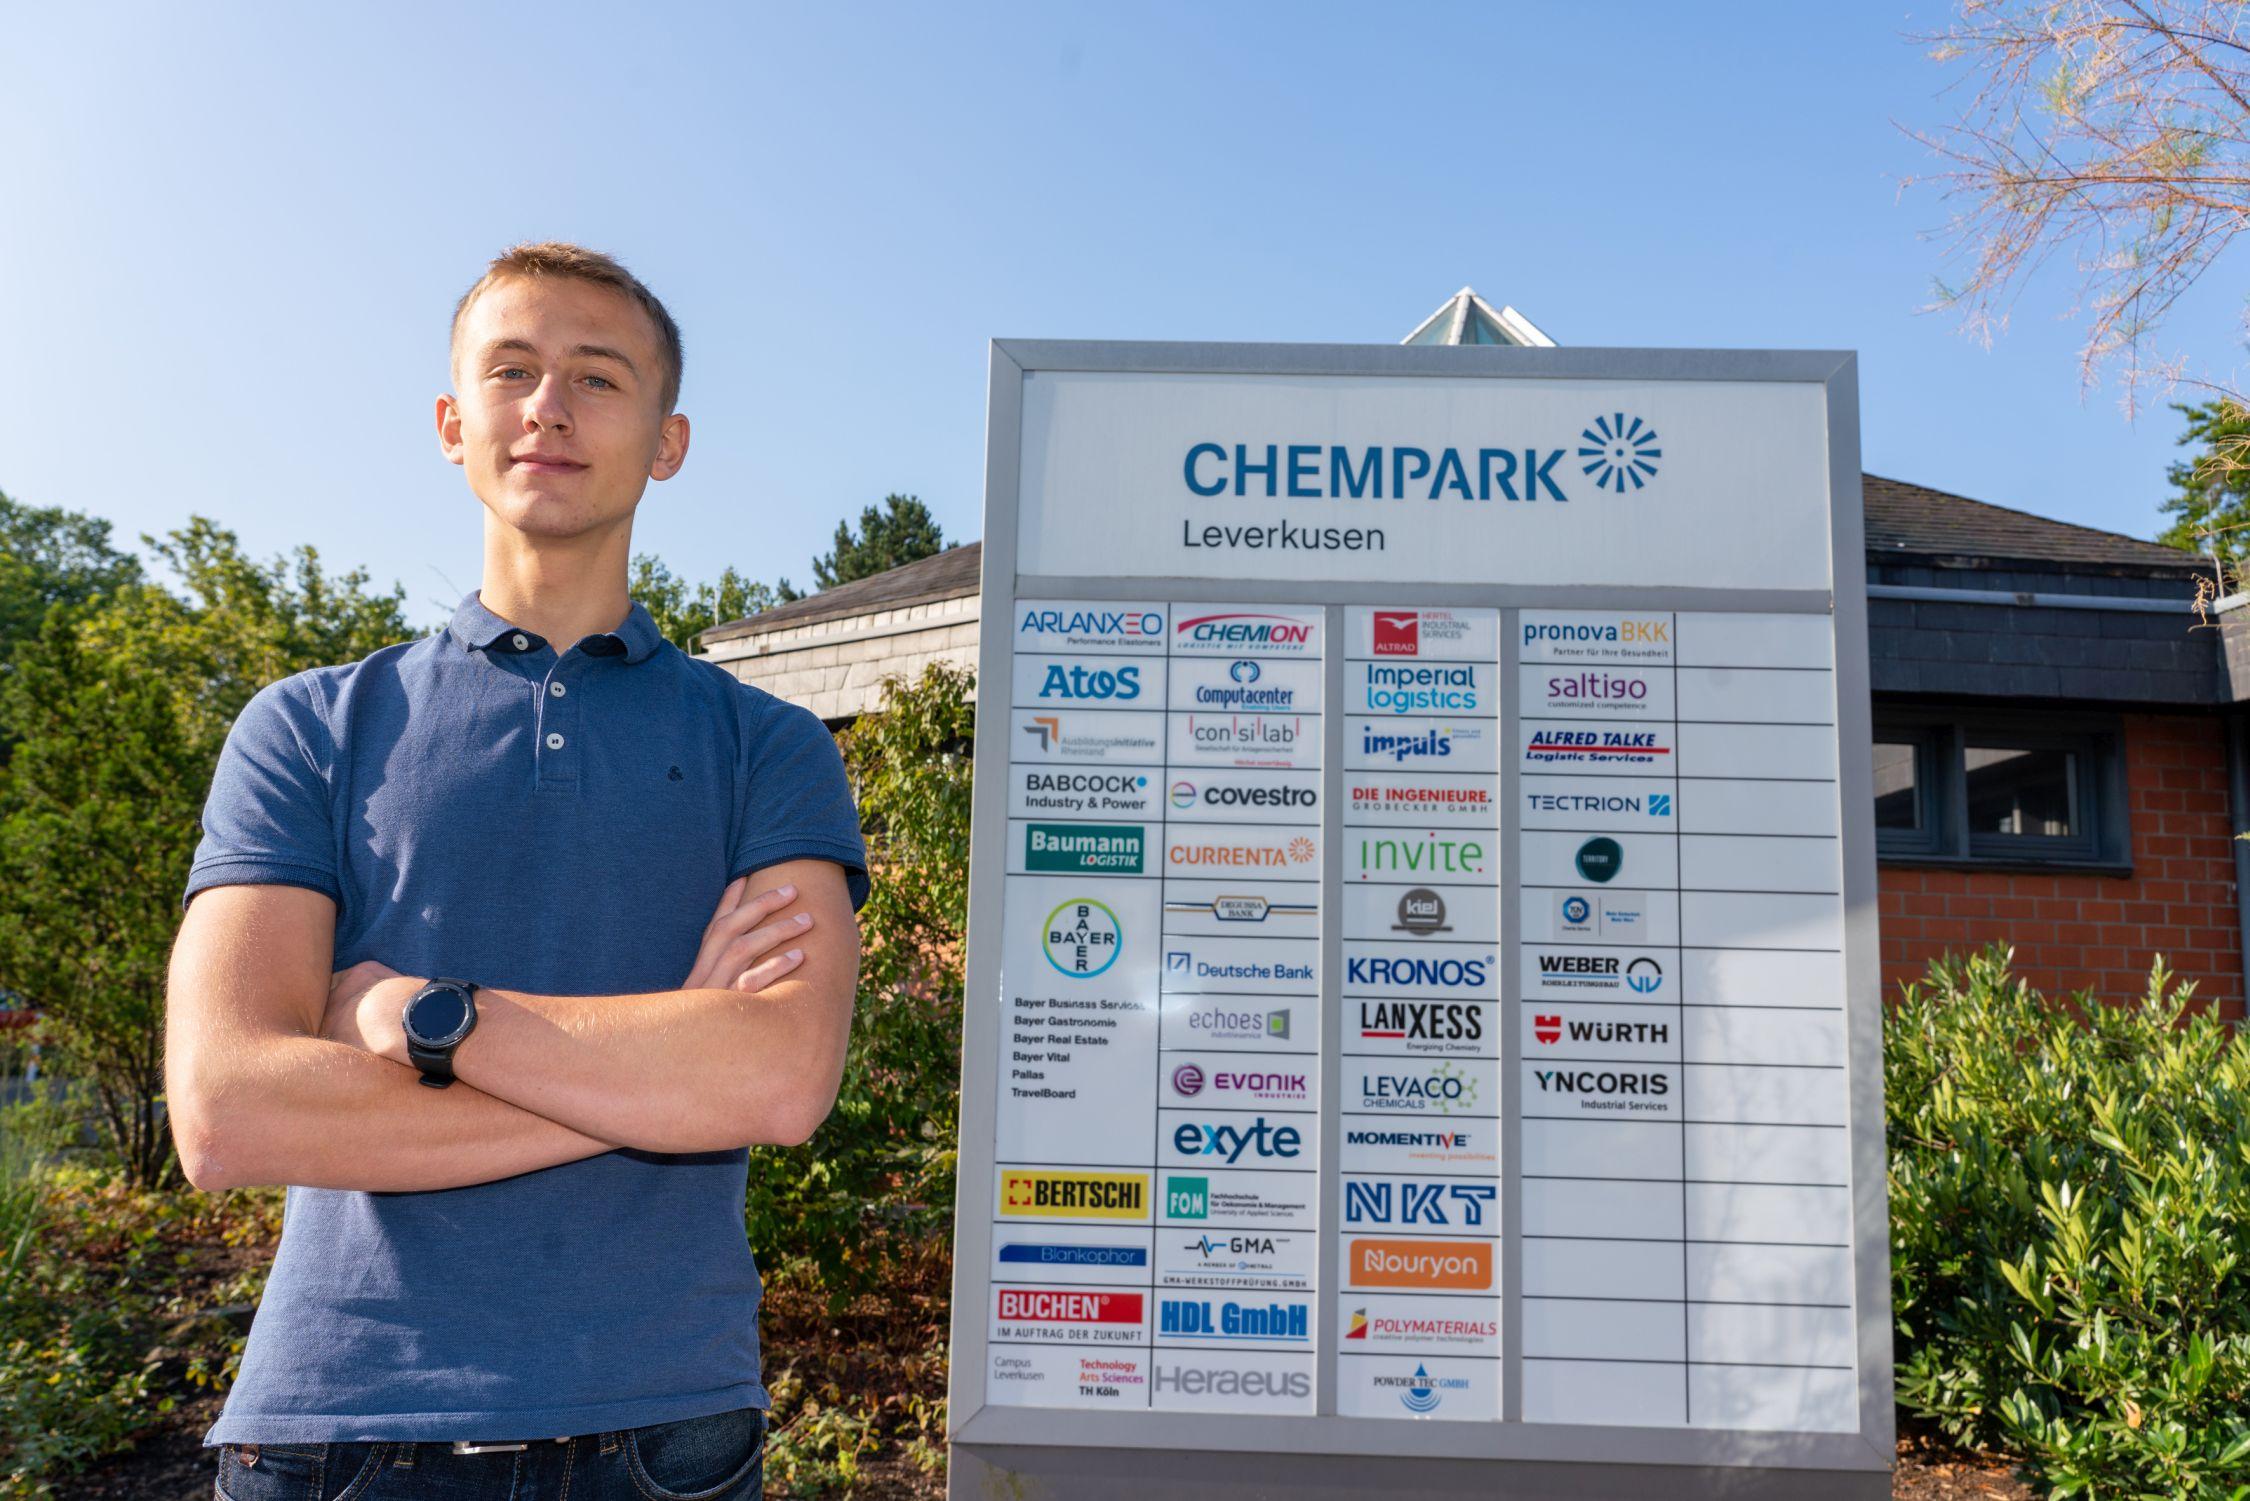 Schüler Erik John ist am14.08.2019 Chemparkleiter in Leverkusen